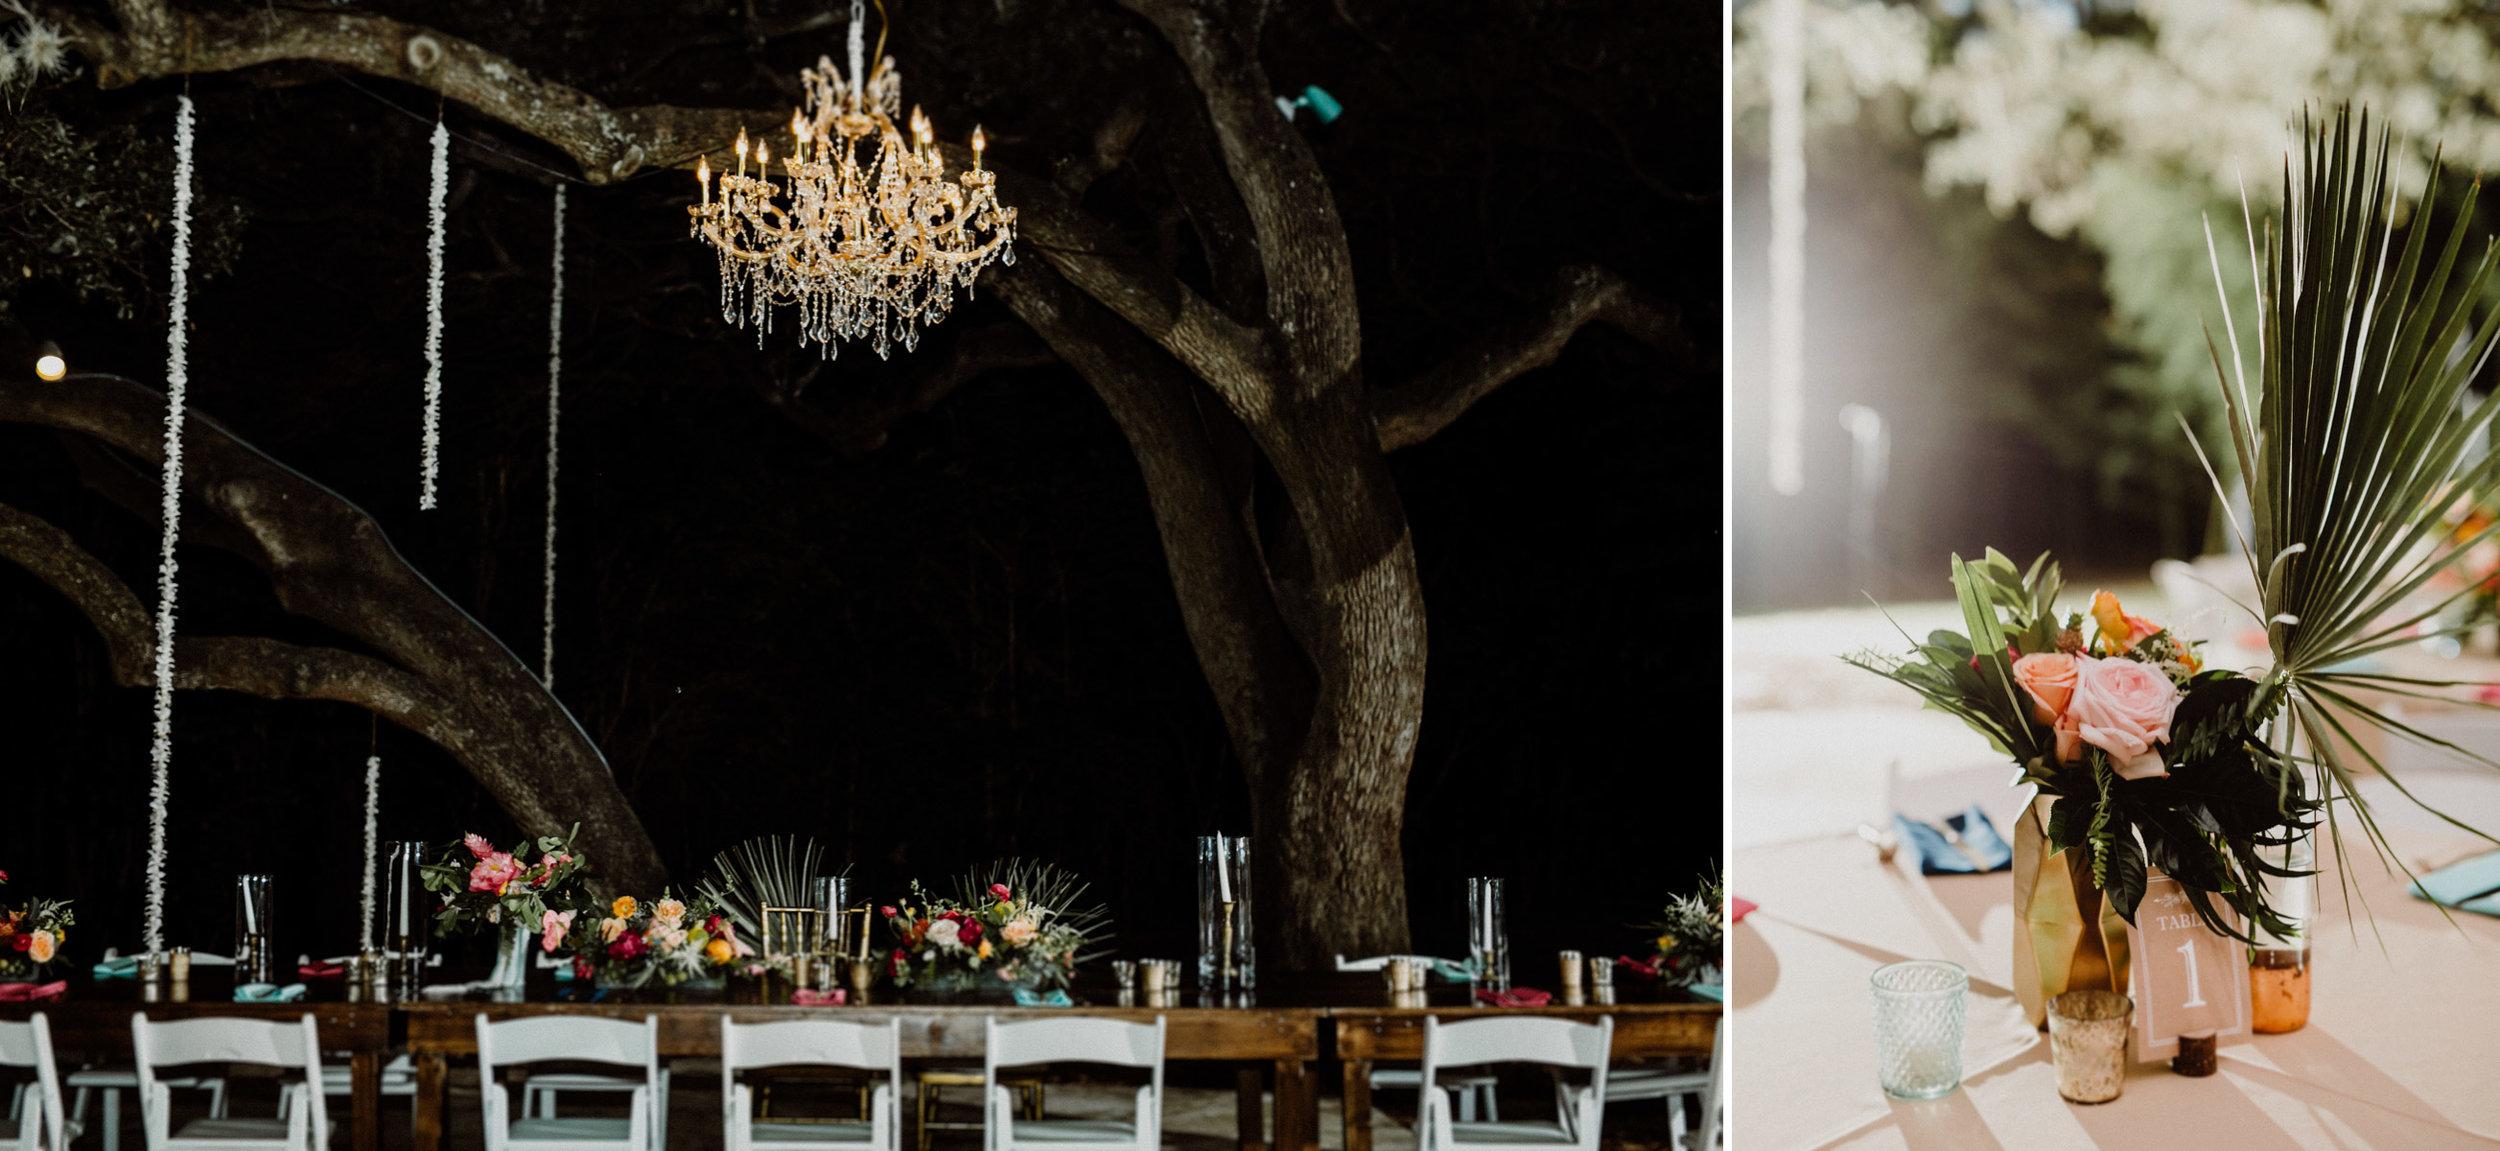 mercury-hall-wedding-11.jpg